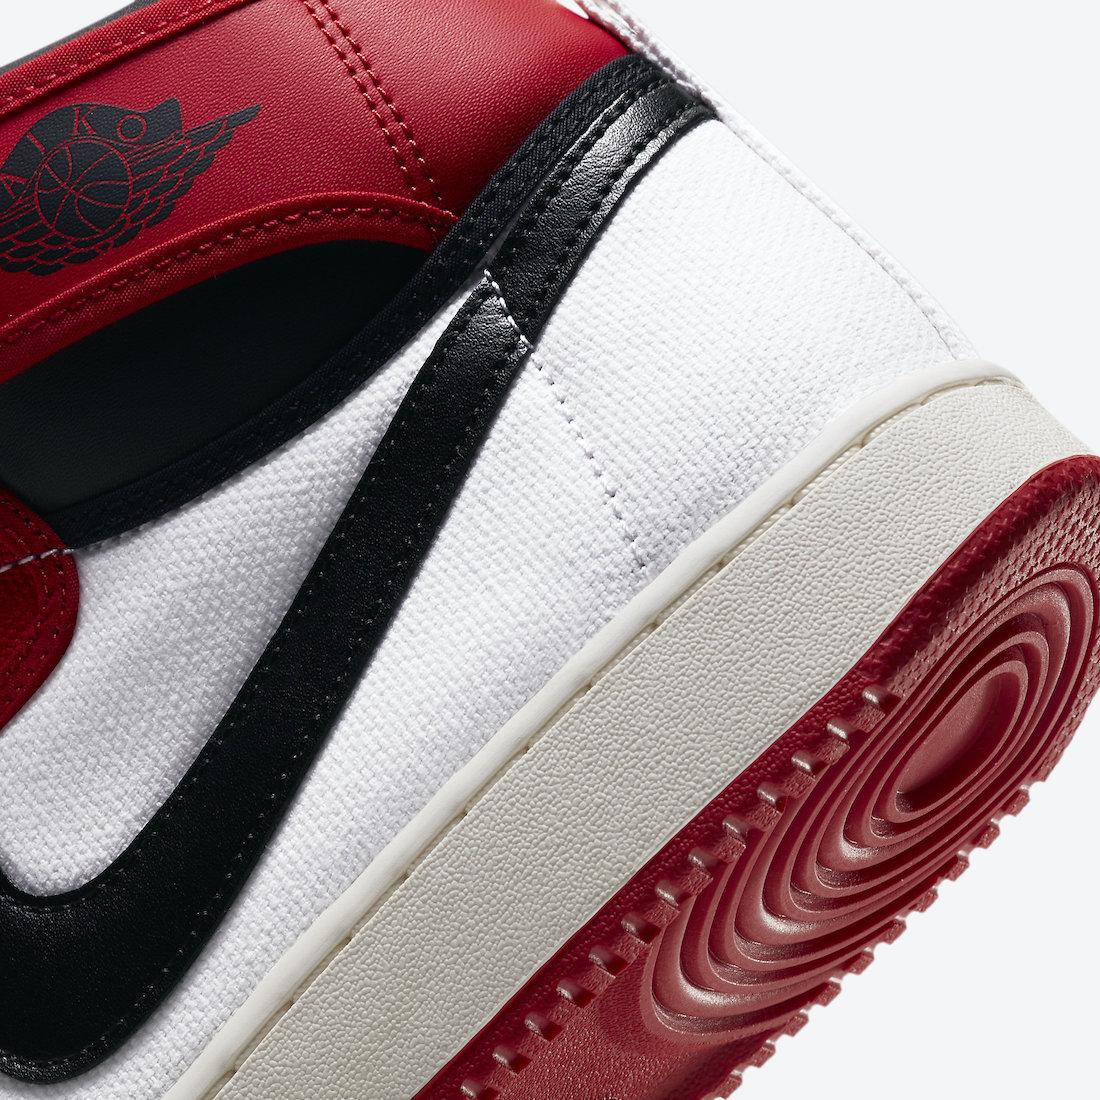 Air-Jordan-1-KO-Chicago-DA9089-100-2021-Release-Date-Price-7